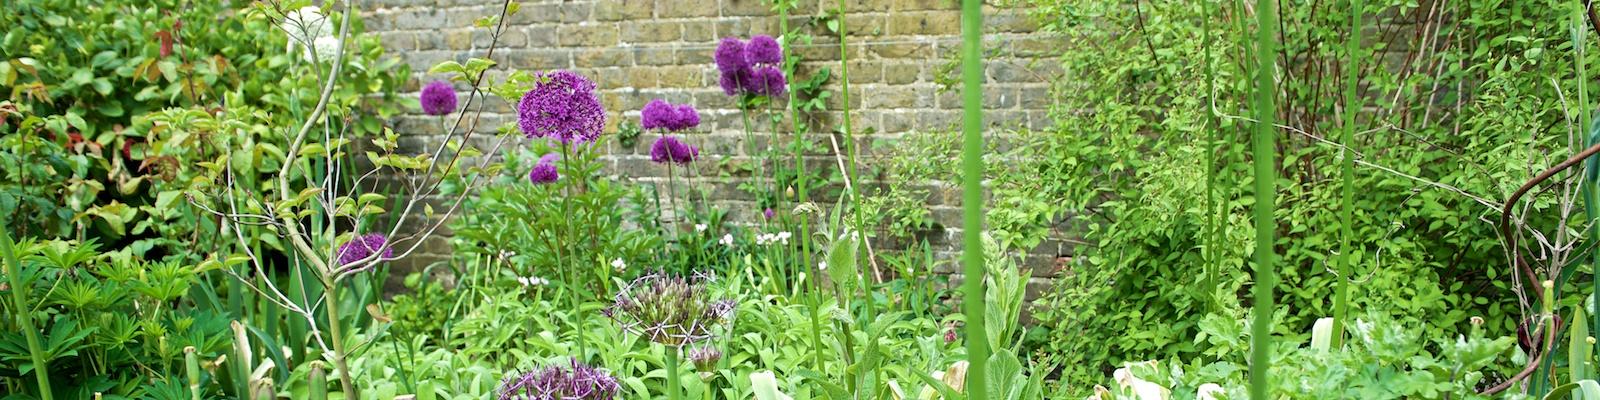 Posy Gentles Gardening Blog